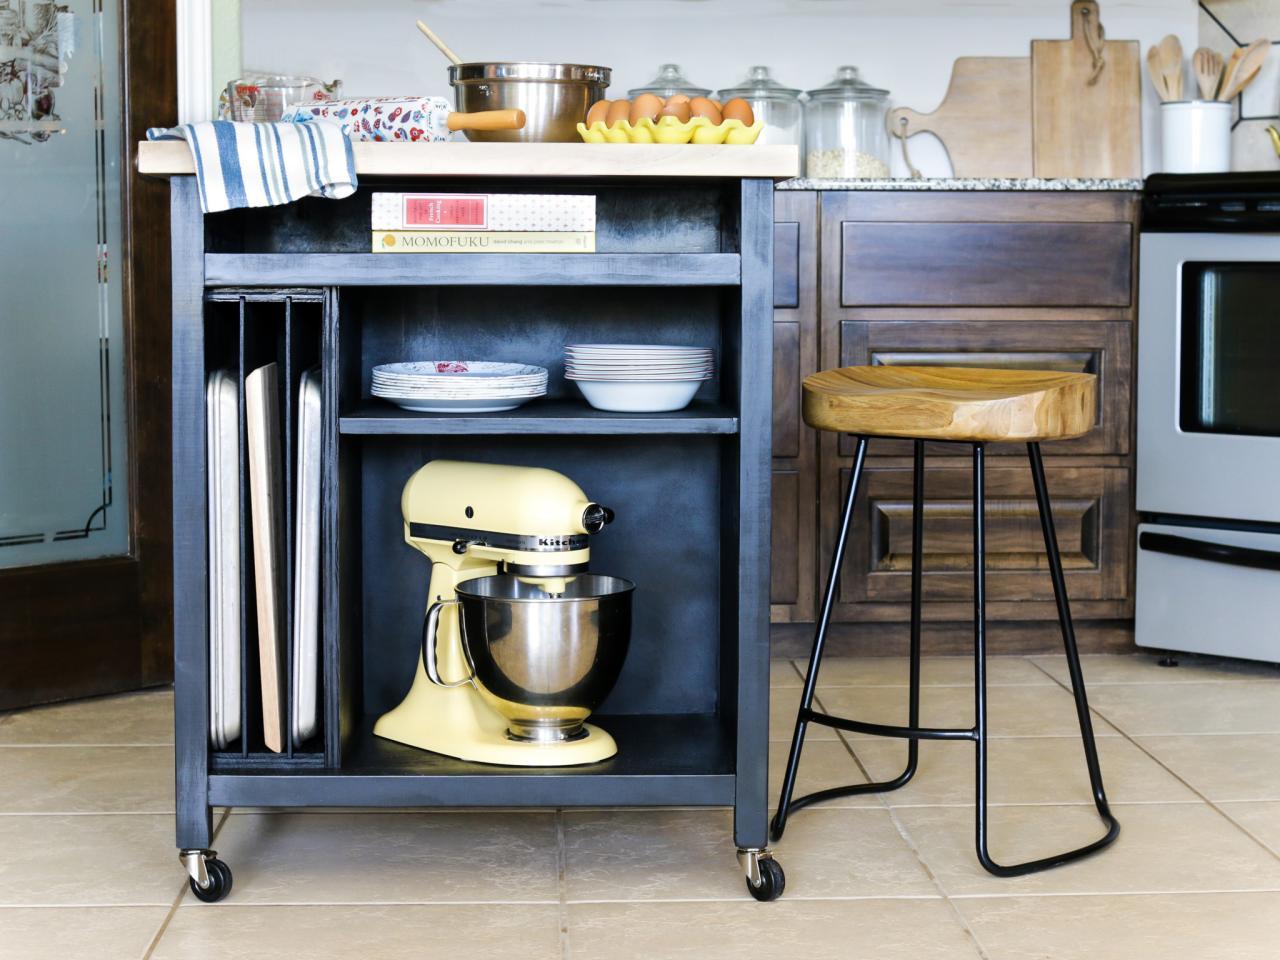 fresh how to build a diy kitchen island on wheelshgtv